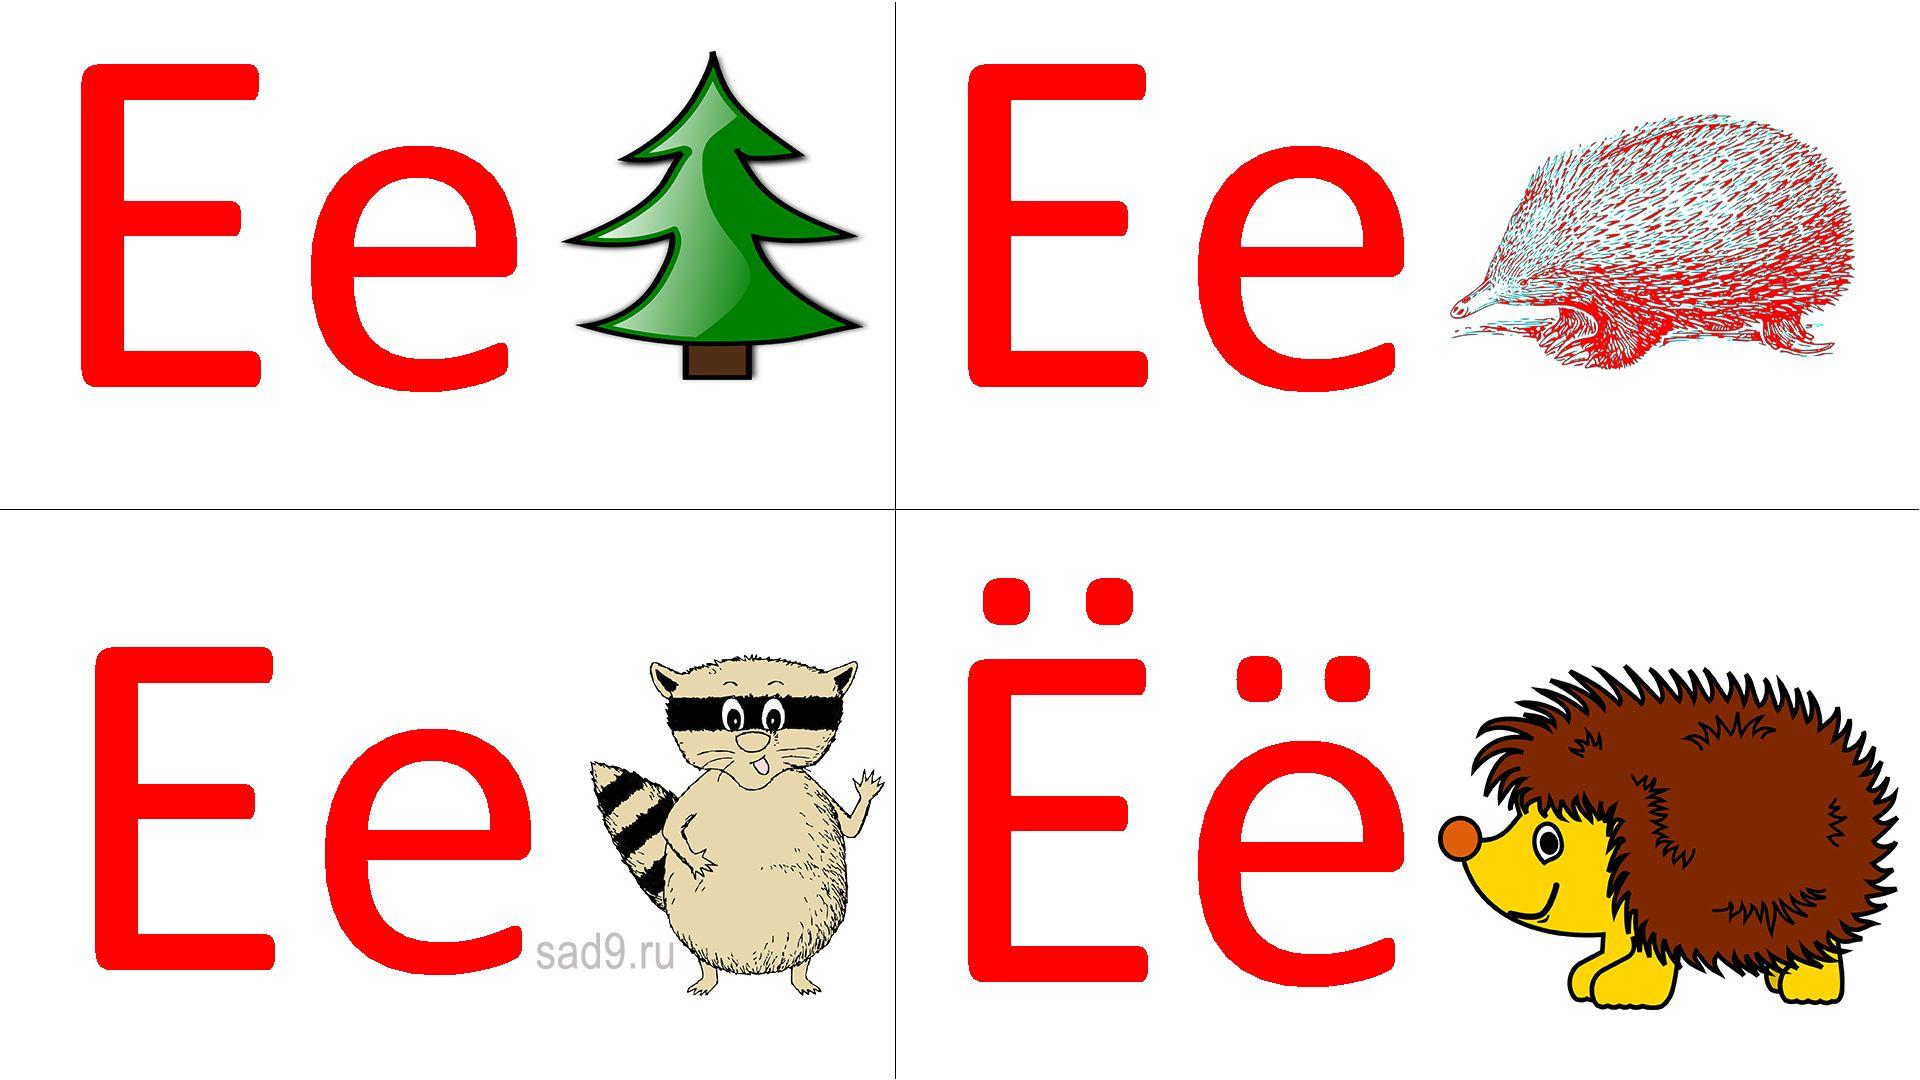 Учим буквы Е, Ё, русский алфавит